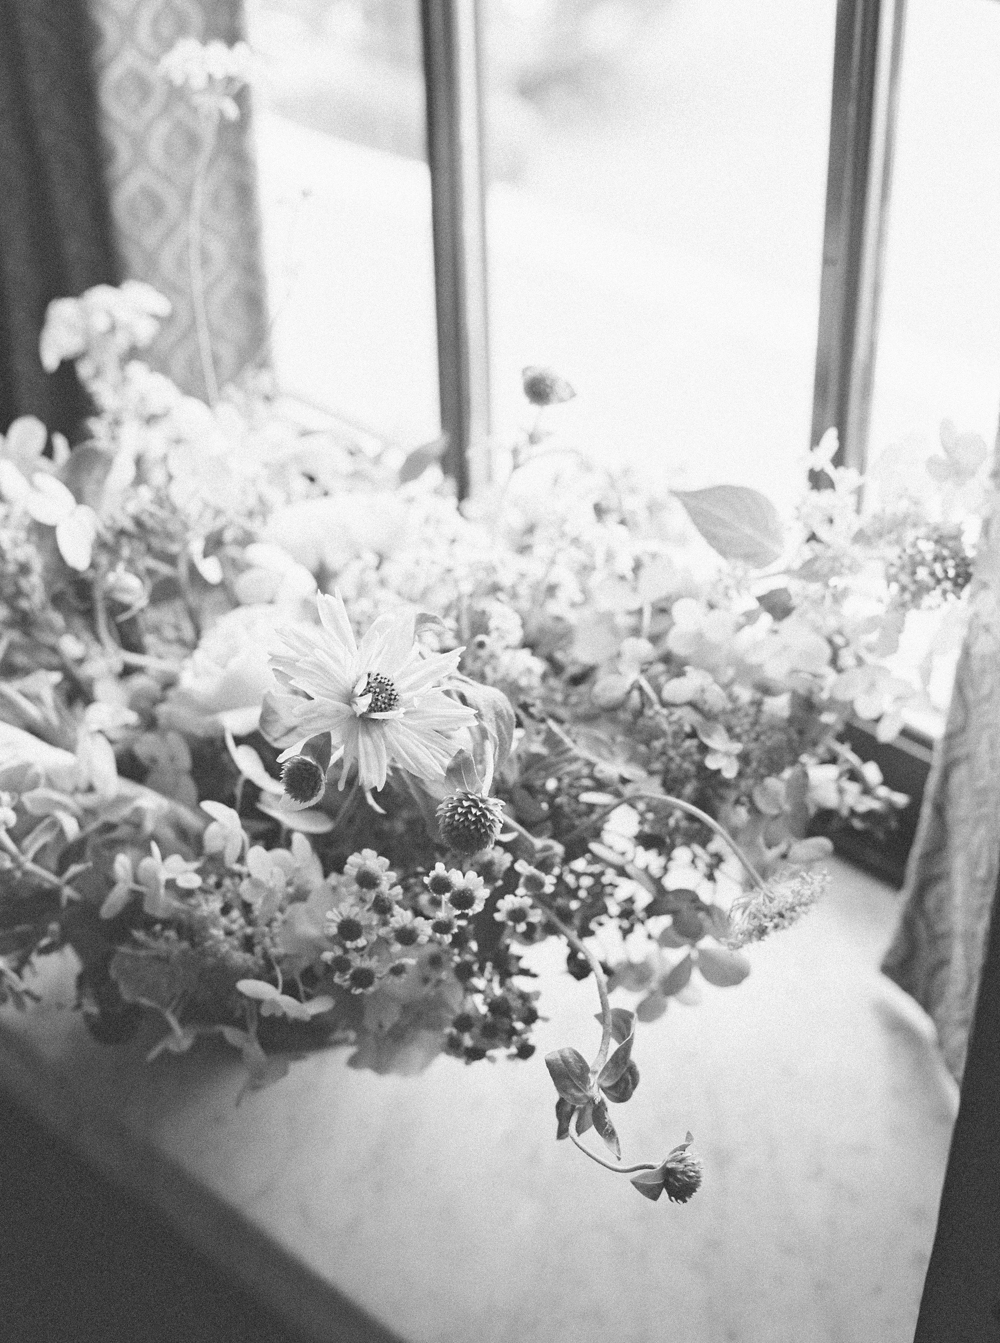 cristina-lozito-photography-flowers-40.jpg